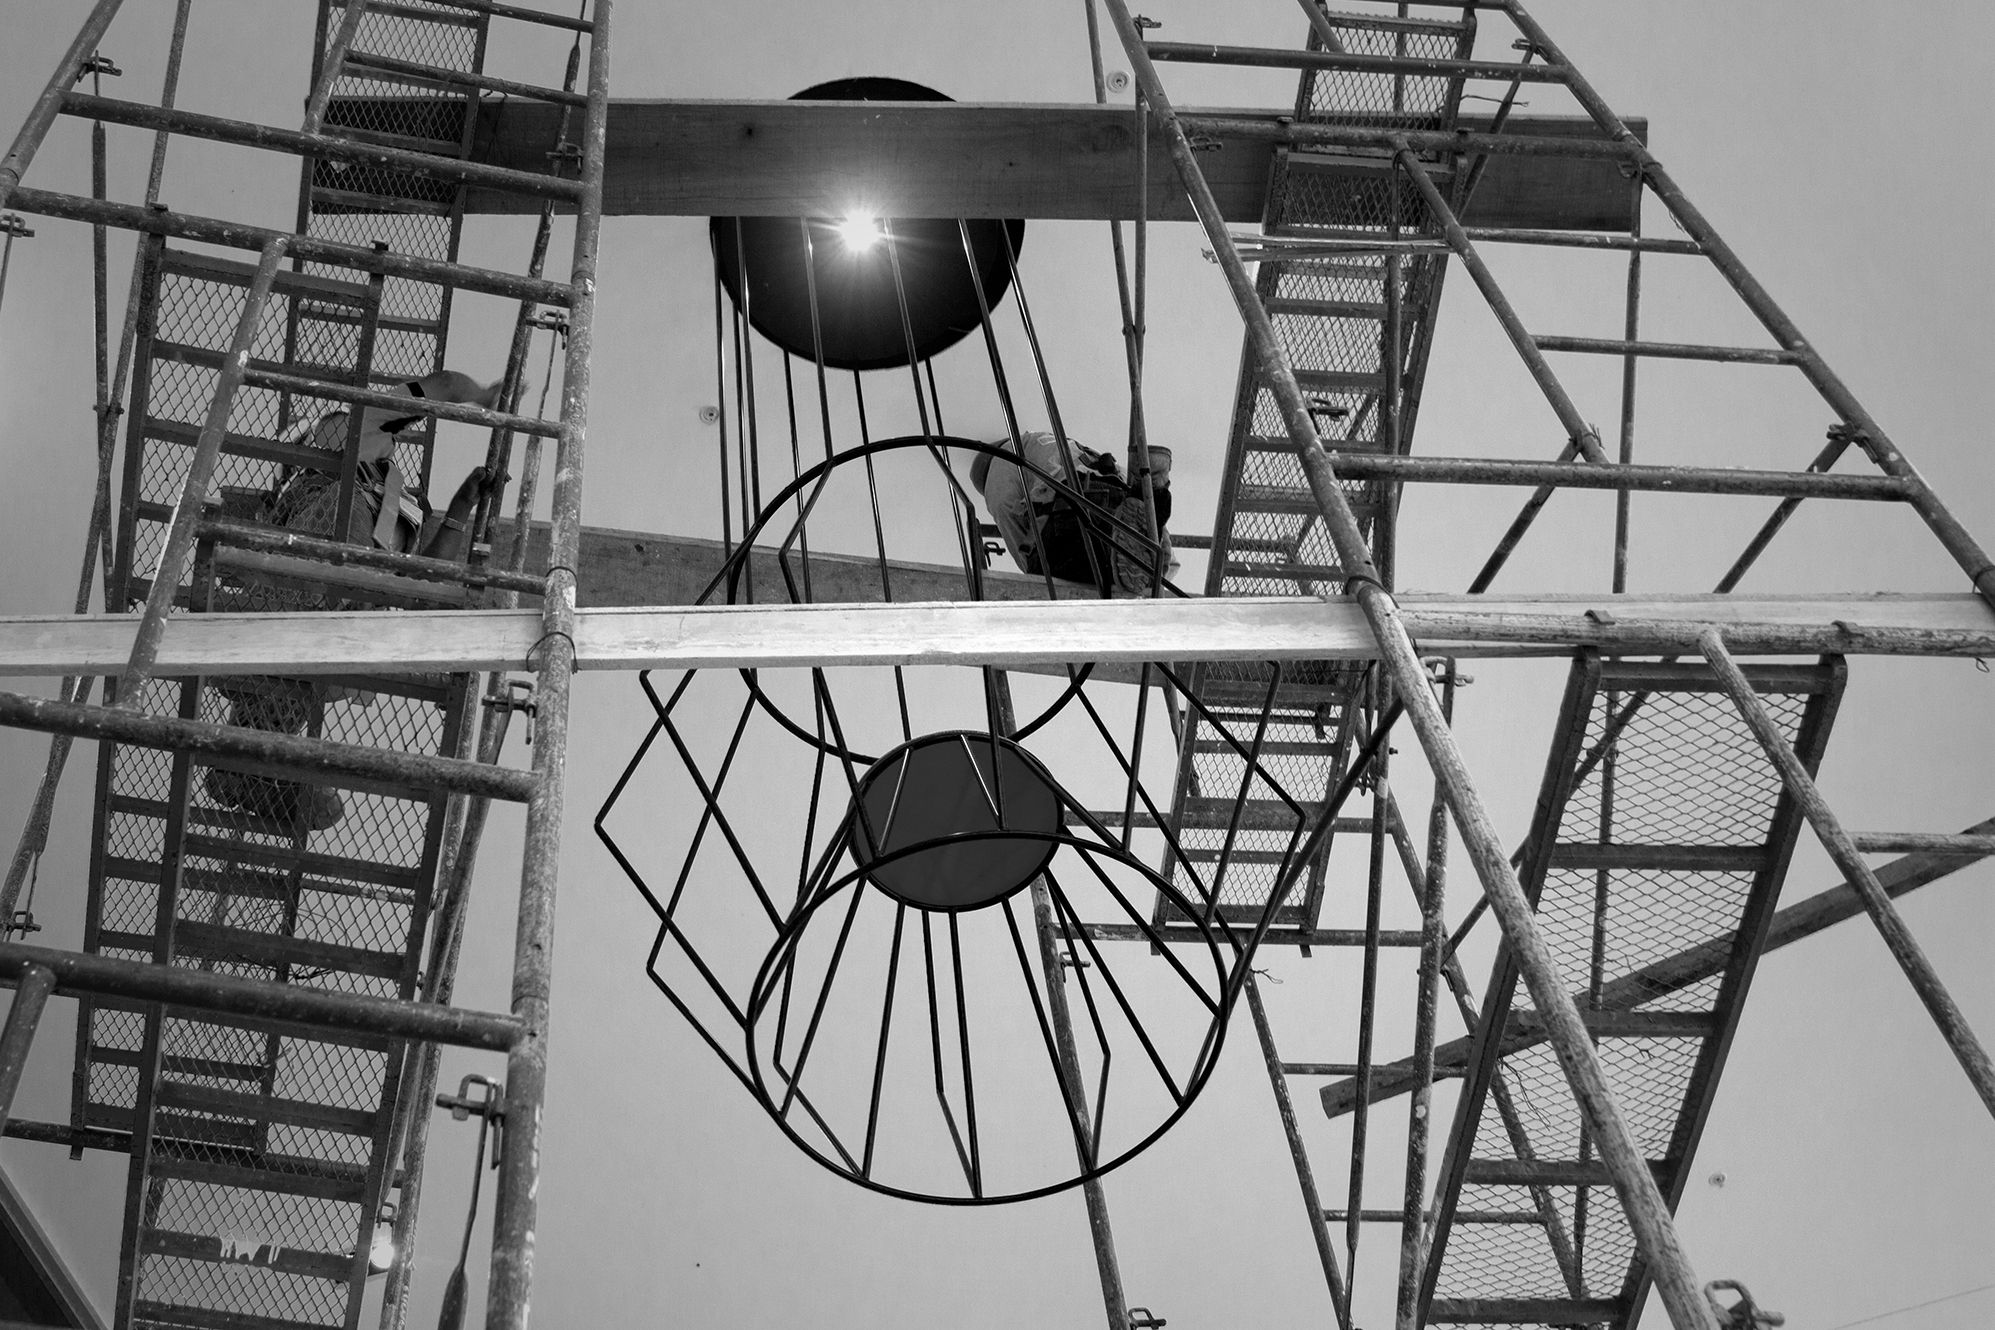 Instalando lámparas gigantes que fueron diseñadas para el mall Zona Centro en Costa Rica   Installing giant lamps that were designed for the Zona Centro mall in Costa Rica